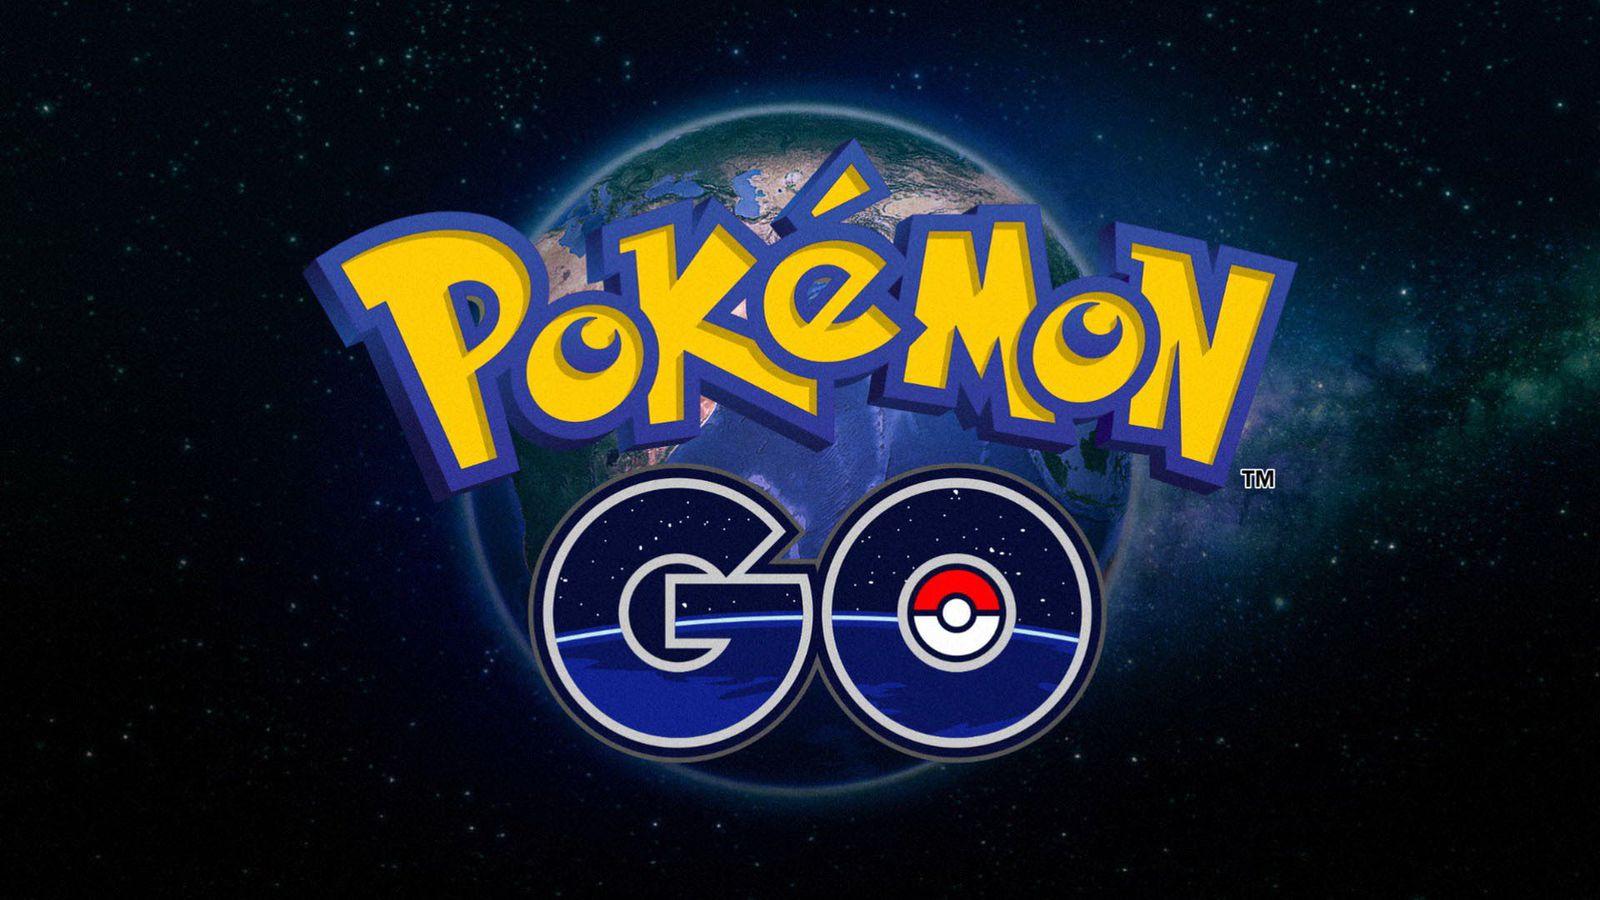 Sunshiny Pokemon Go Promo Code Pokemon Go Promo Codes September 2018 Free List Pokemon Go Promo Codes List July 2017 Pokemon Go Promo Codes List 2017 houzz-03 Pokemon Go Promo Codes List